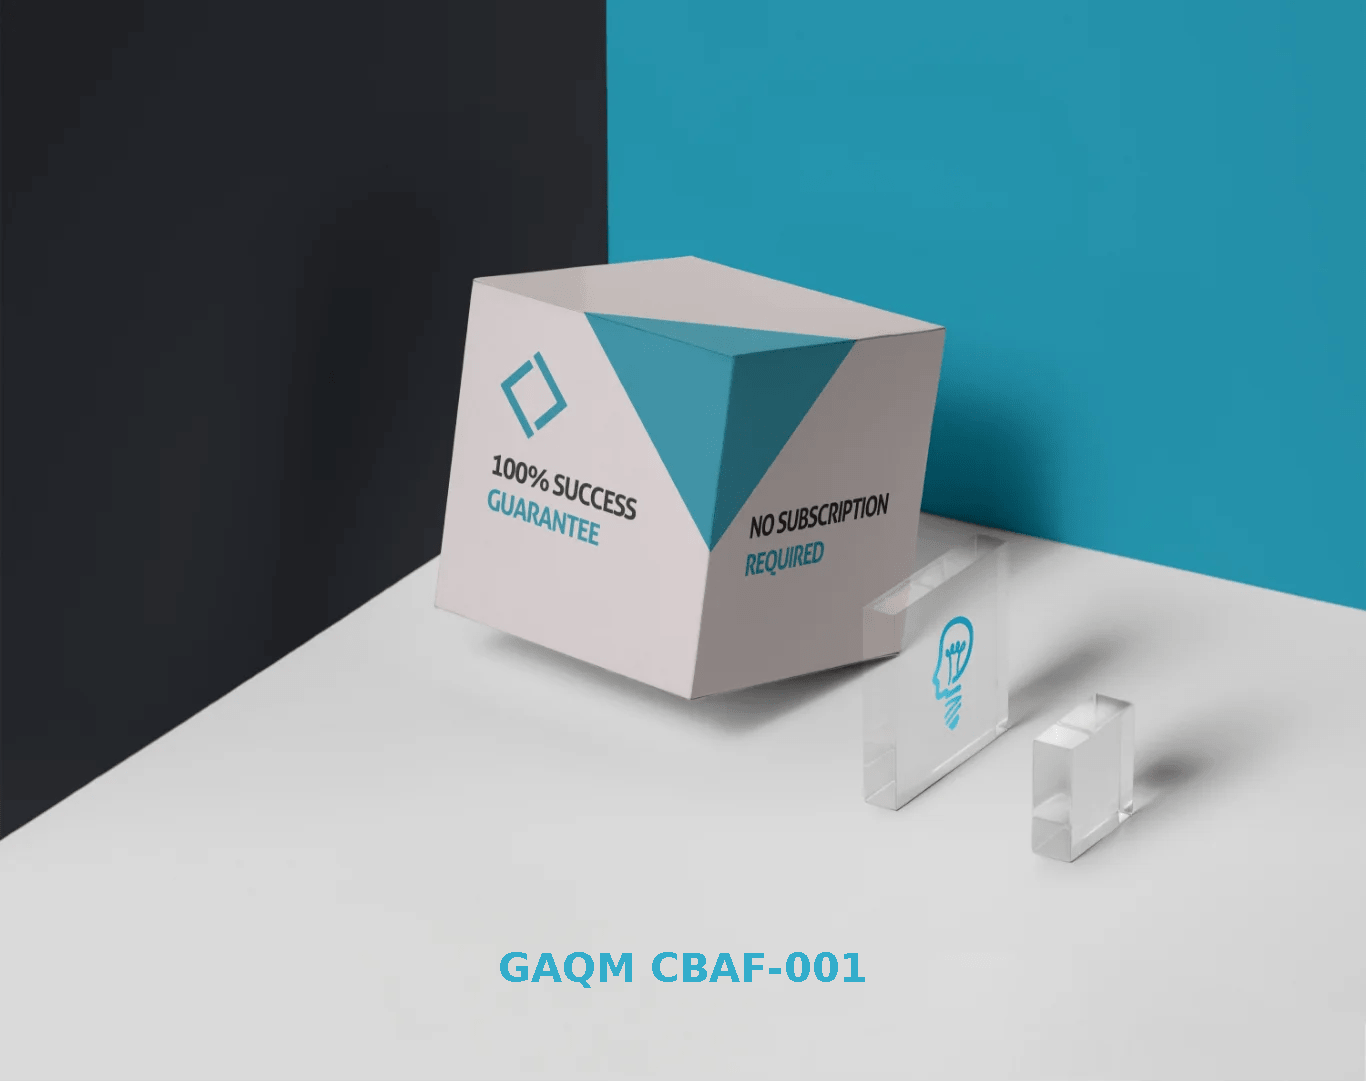 GAQM CBAF-001 Exams